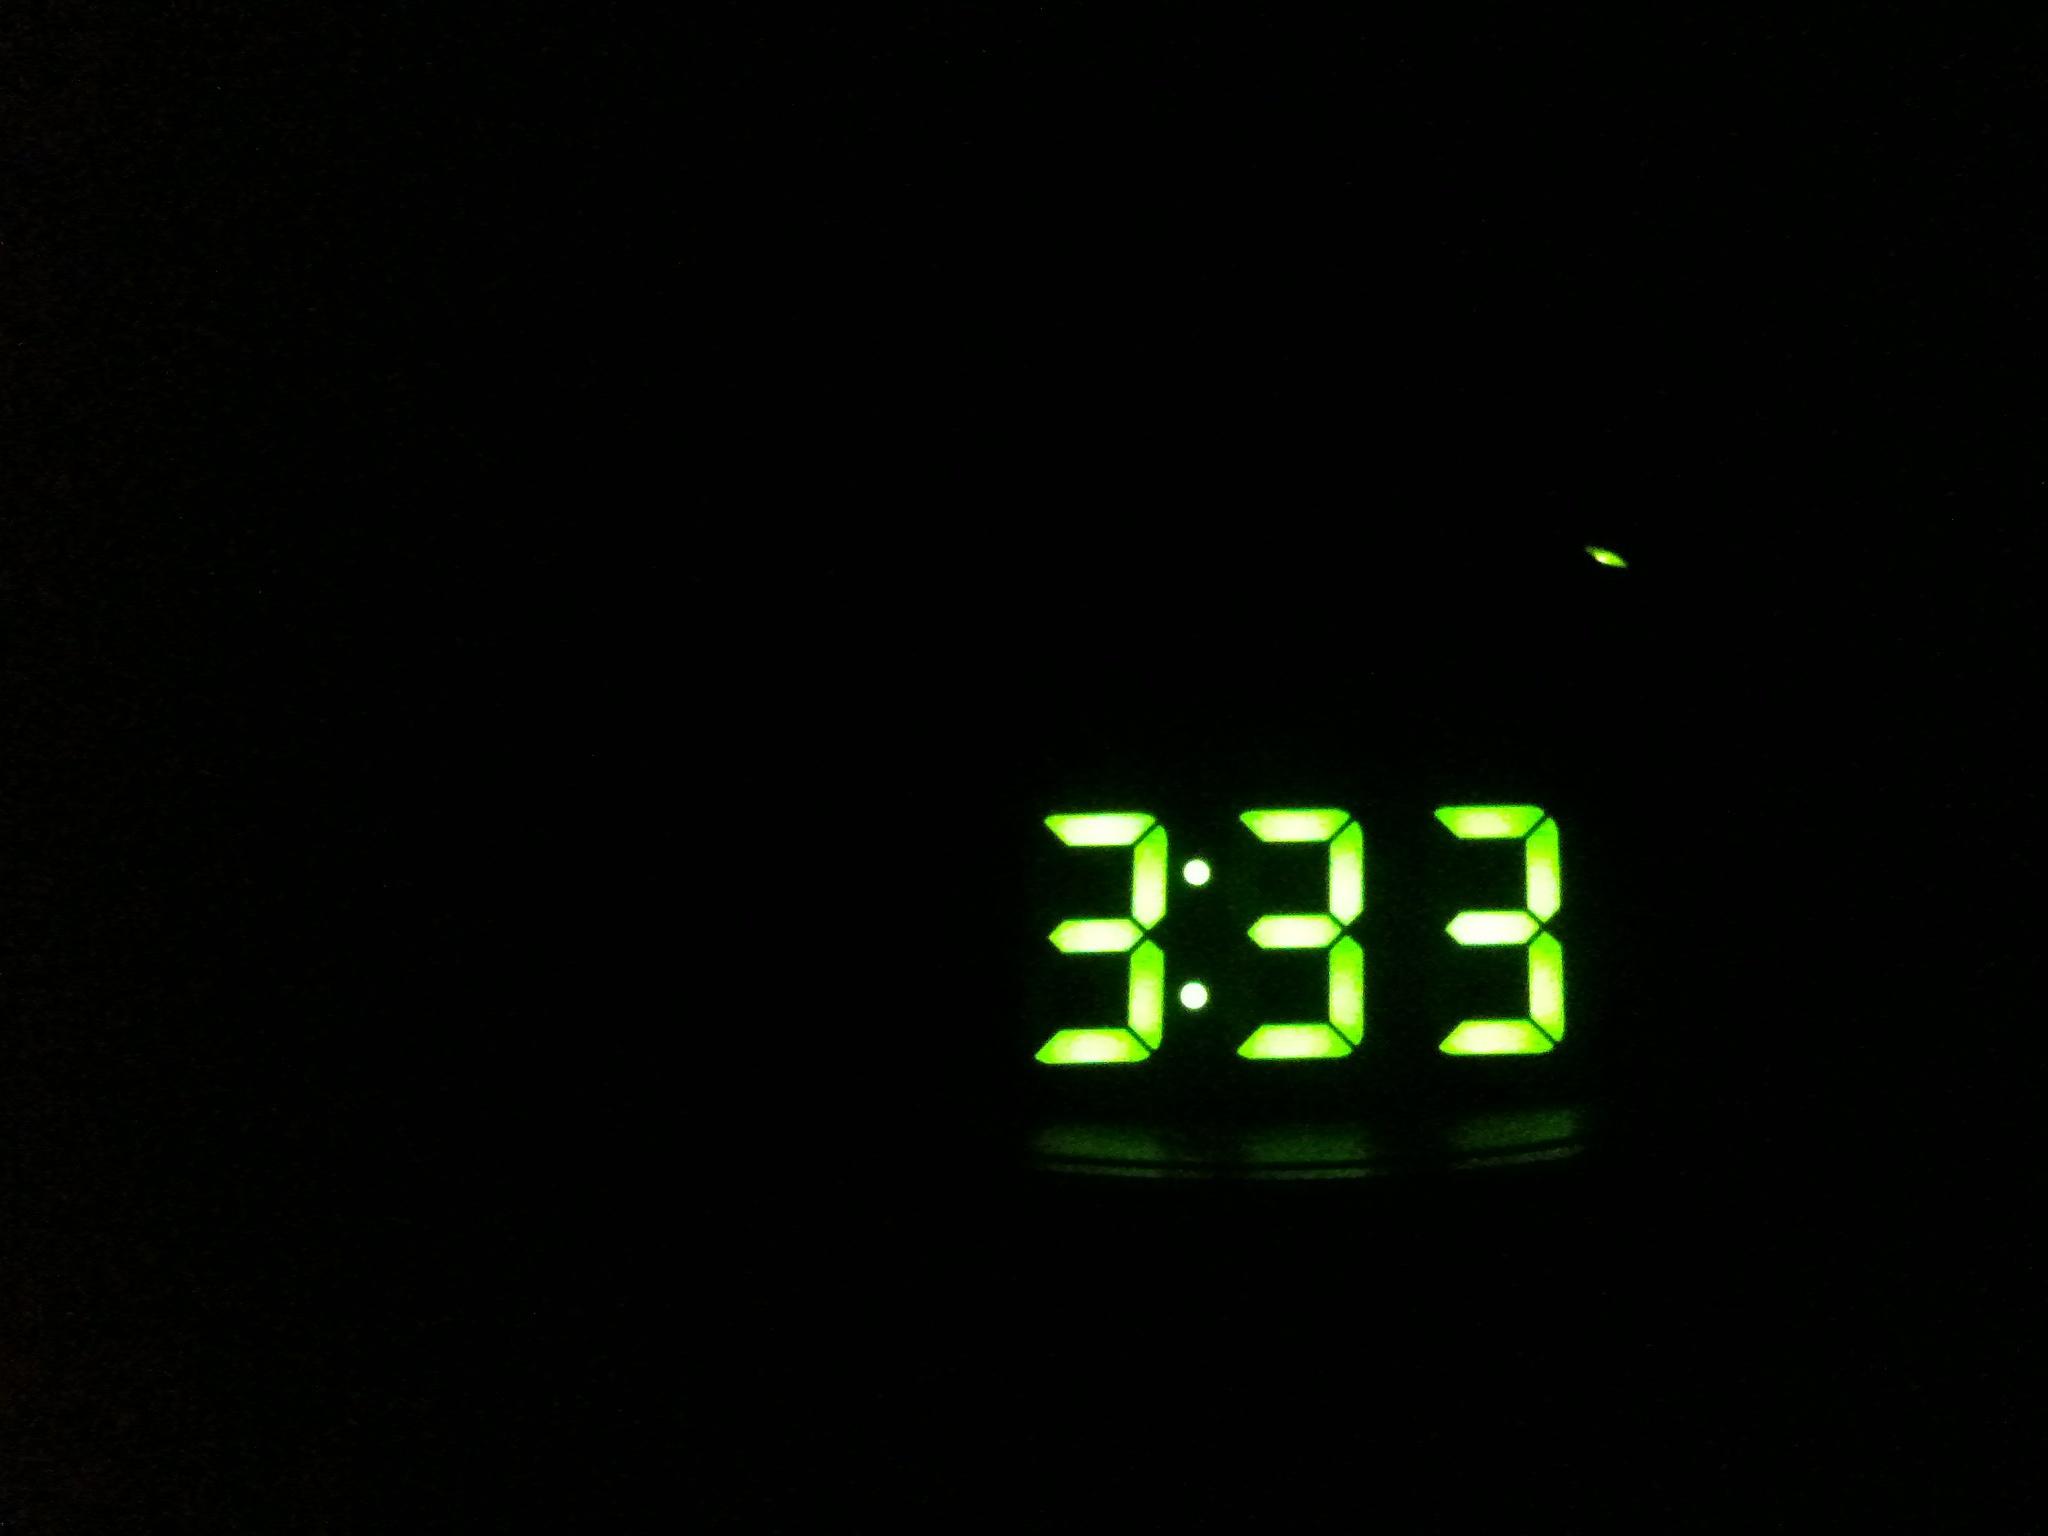 """3:33"" by Michael Galpert via  Flickr  ( CC BY 2.0 )"